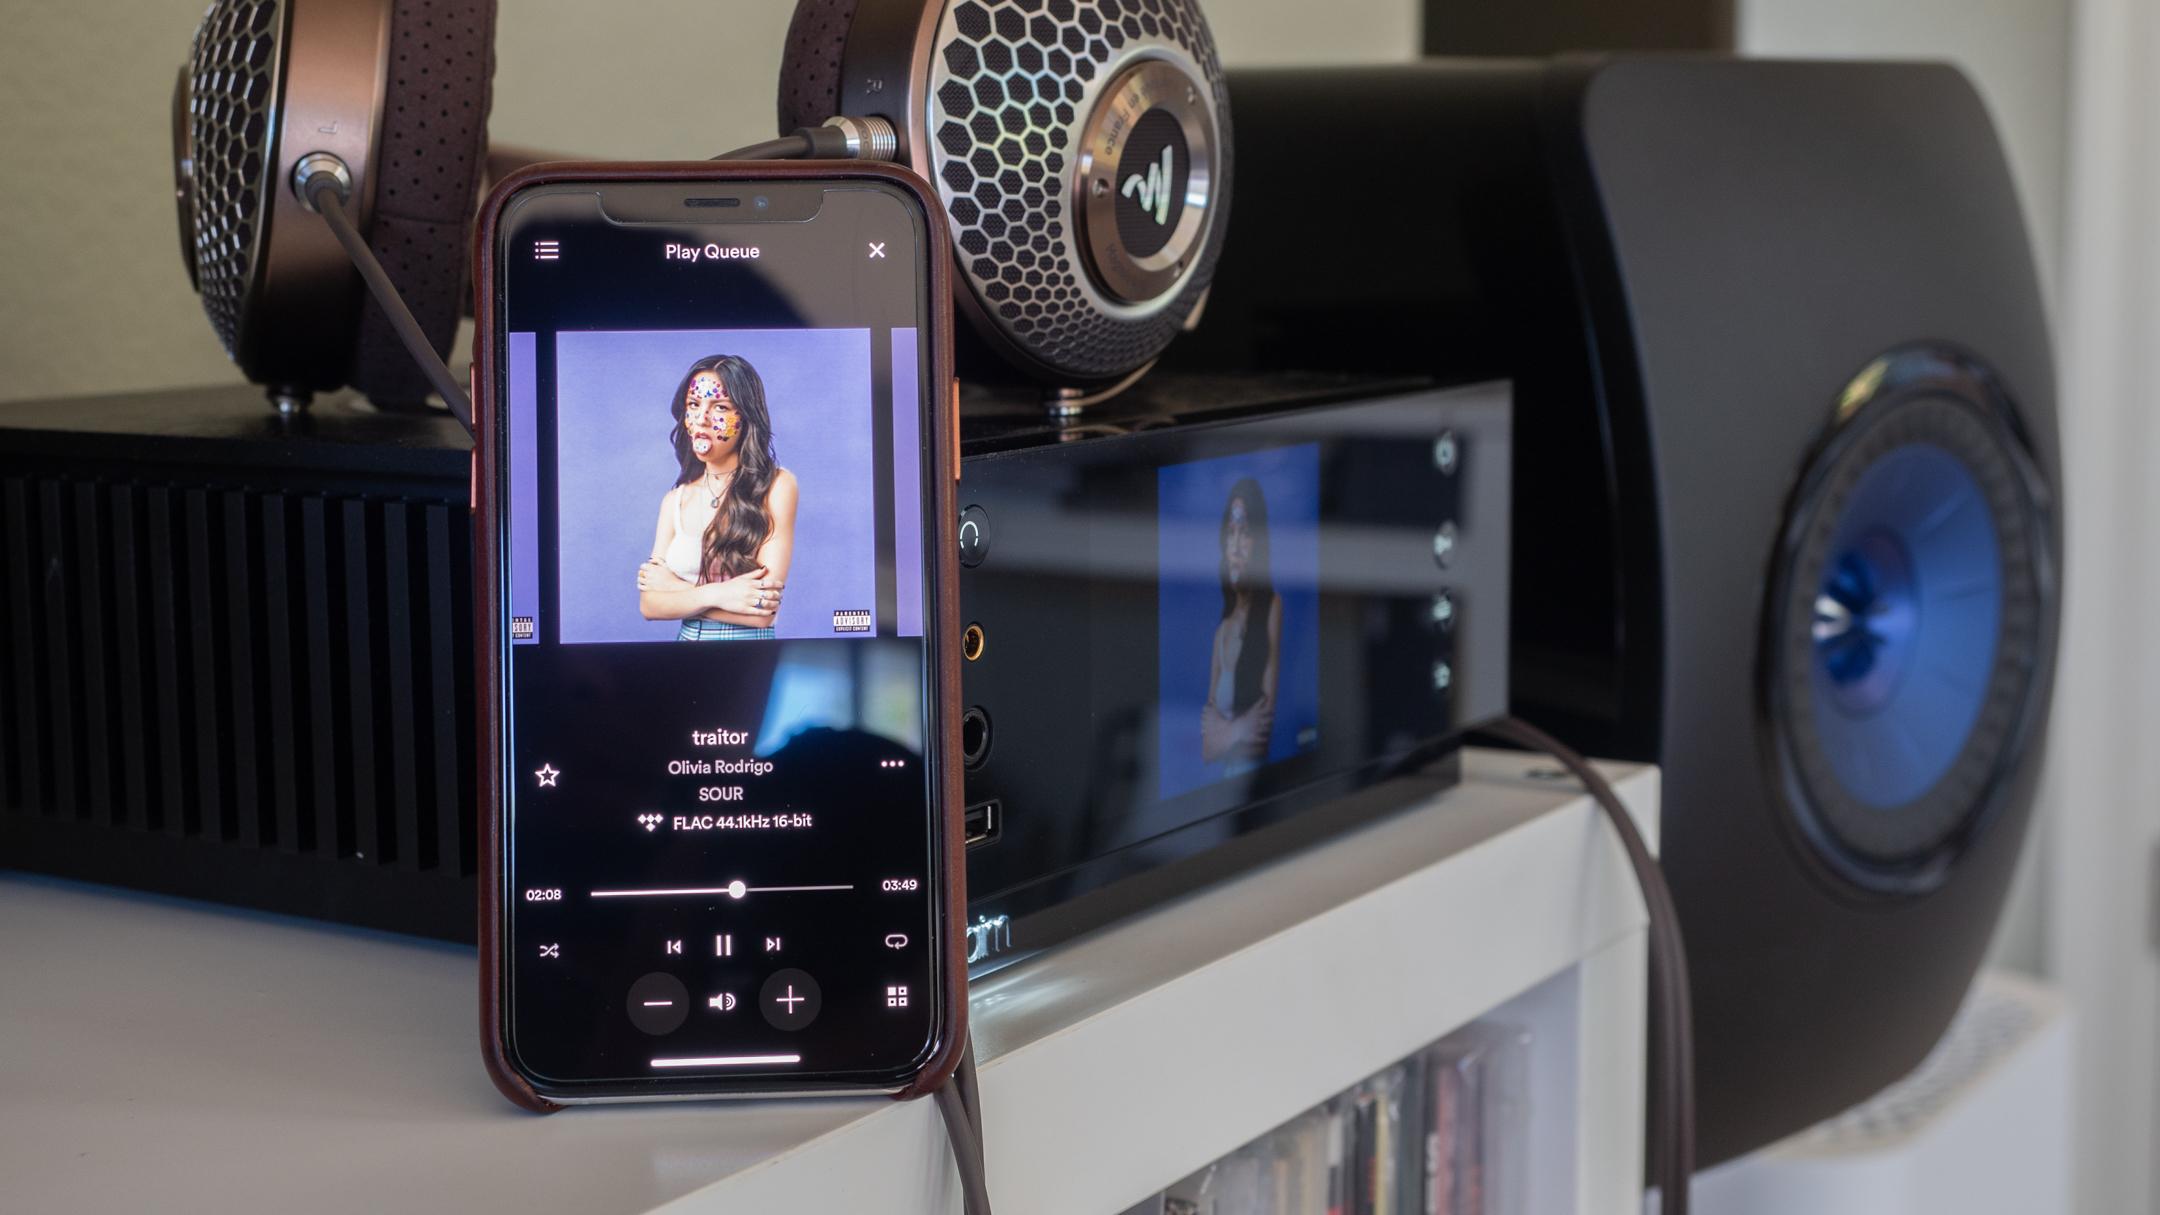 Pictured: Naim Uniti Atom Headphone Edition on a shelf.